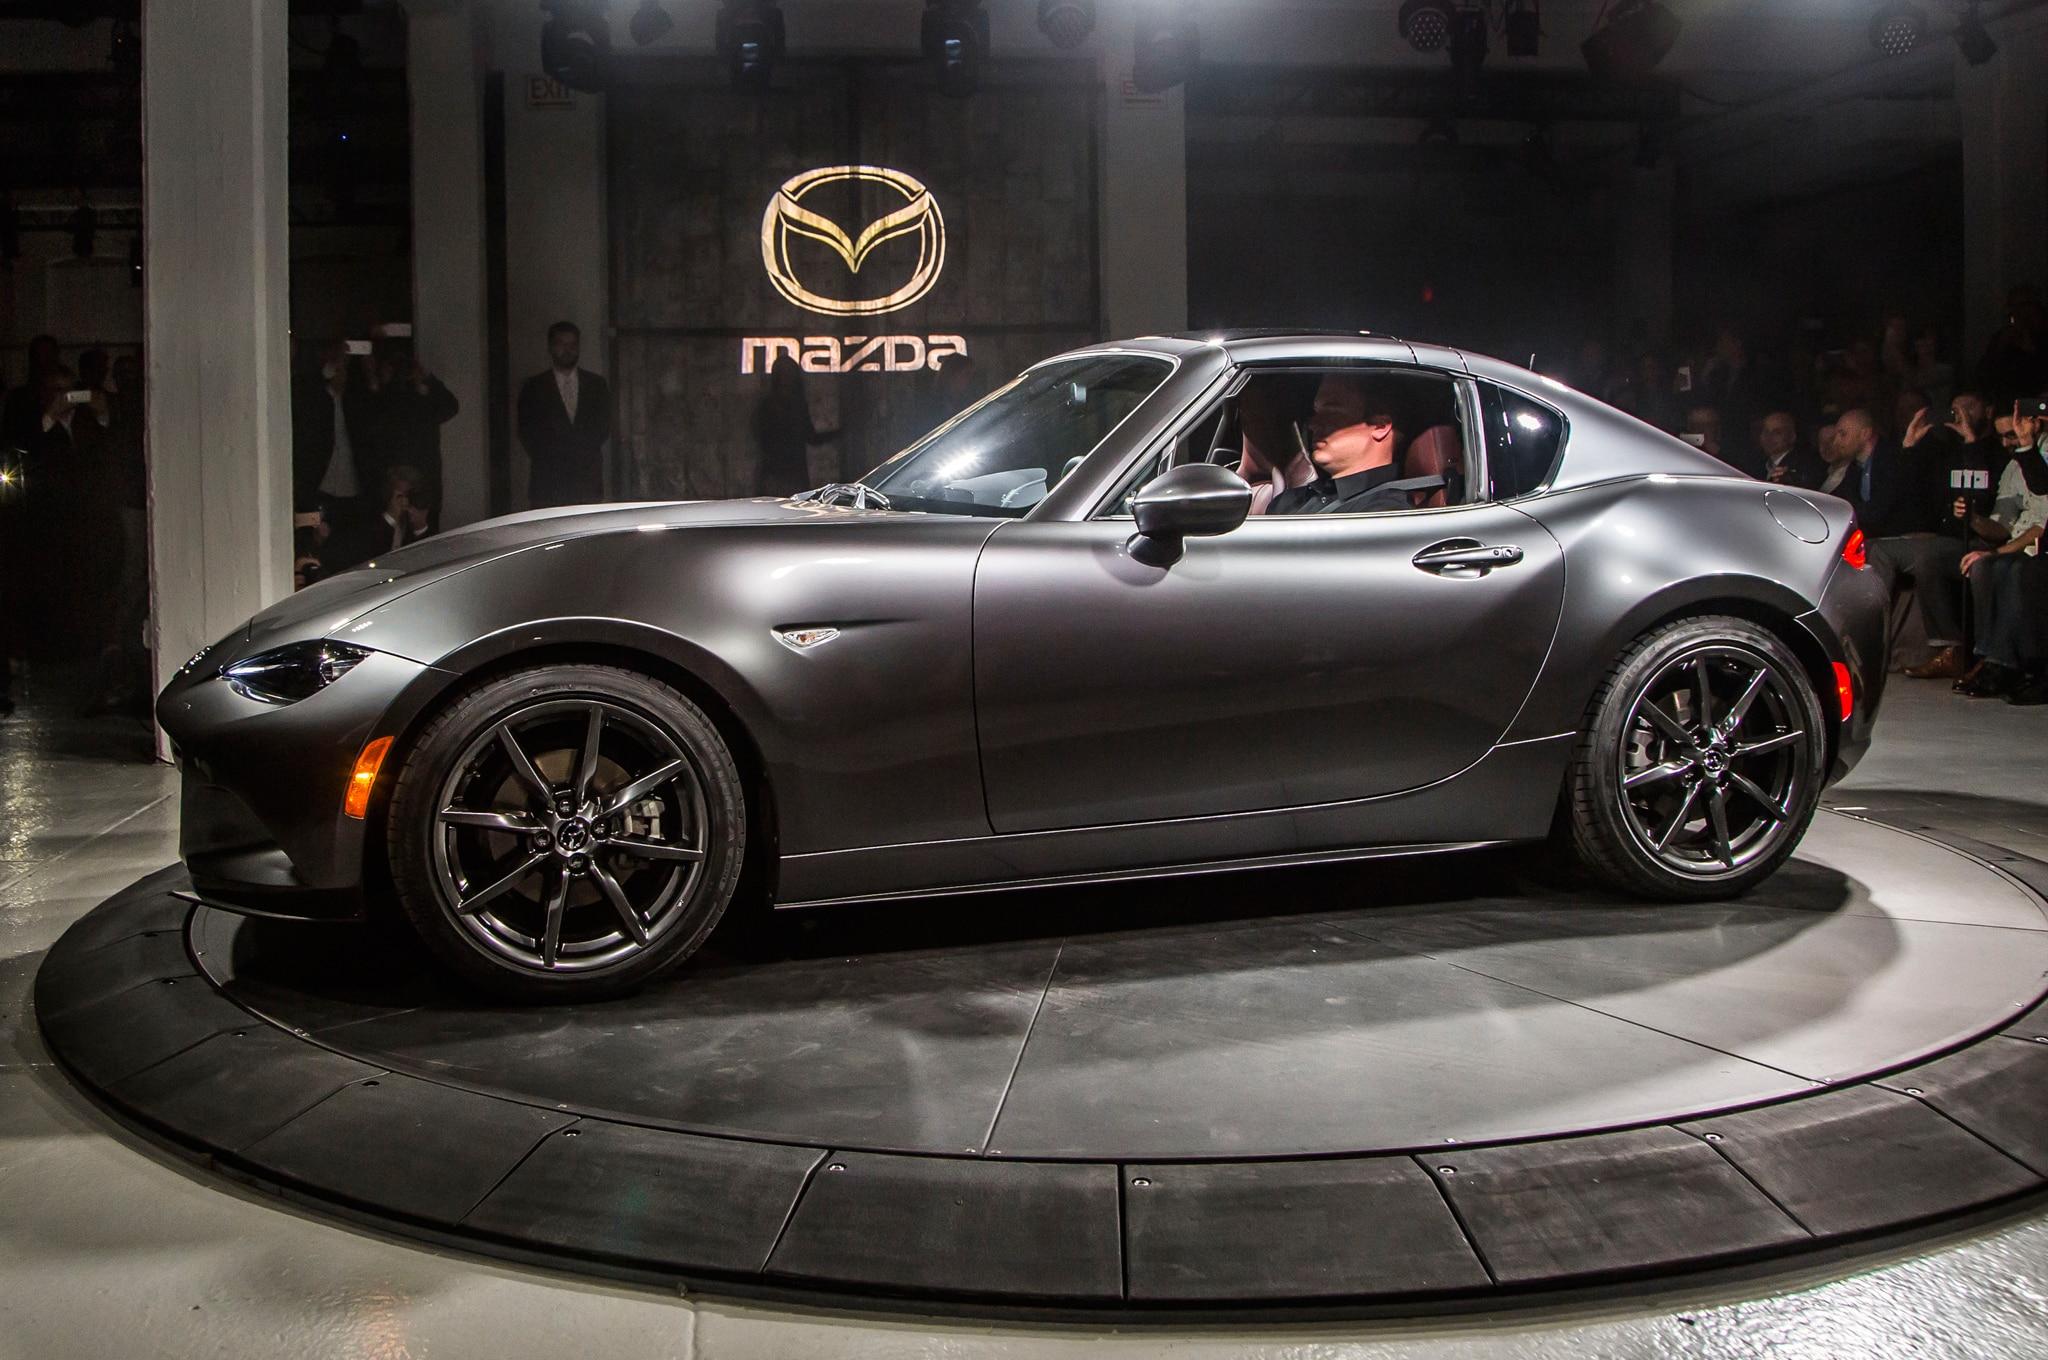 2017 Mazda MX 5 Miata RF On Stage Side Front View